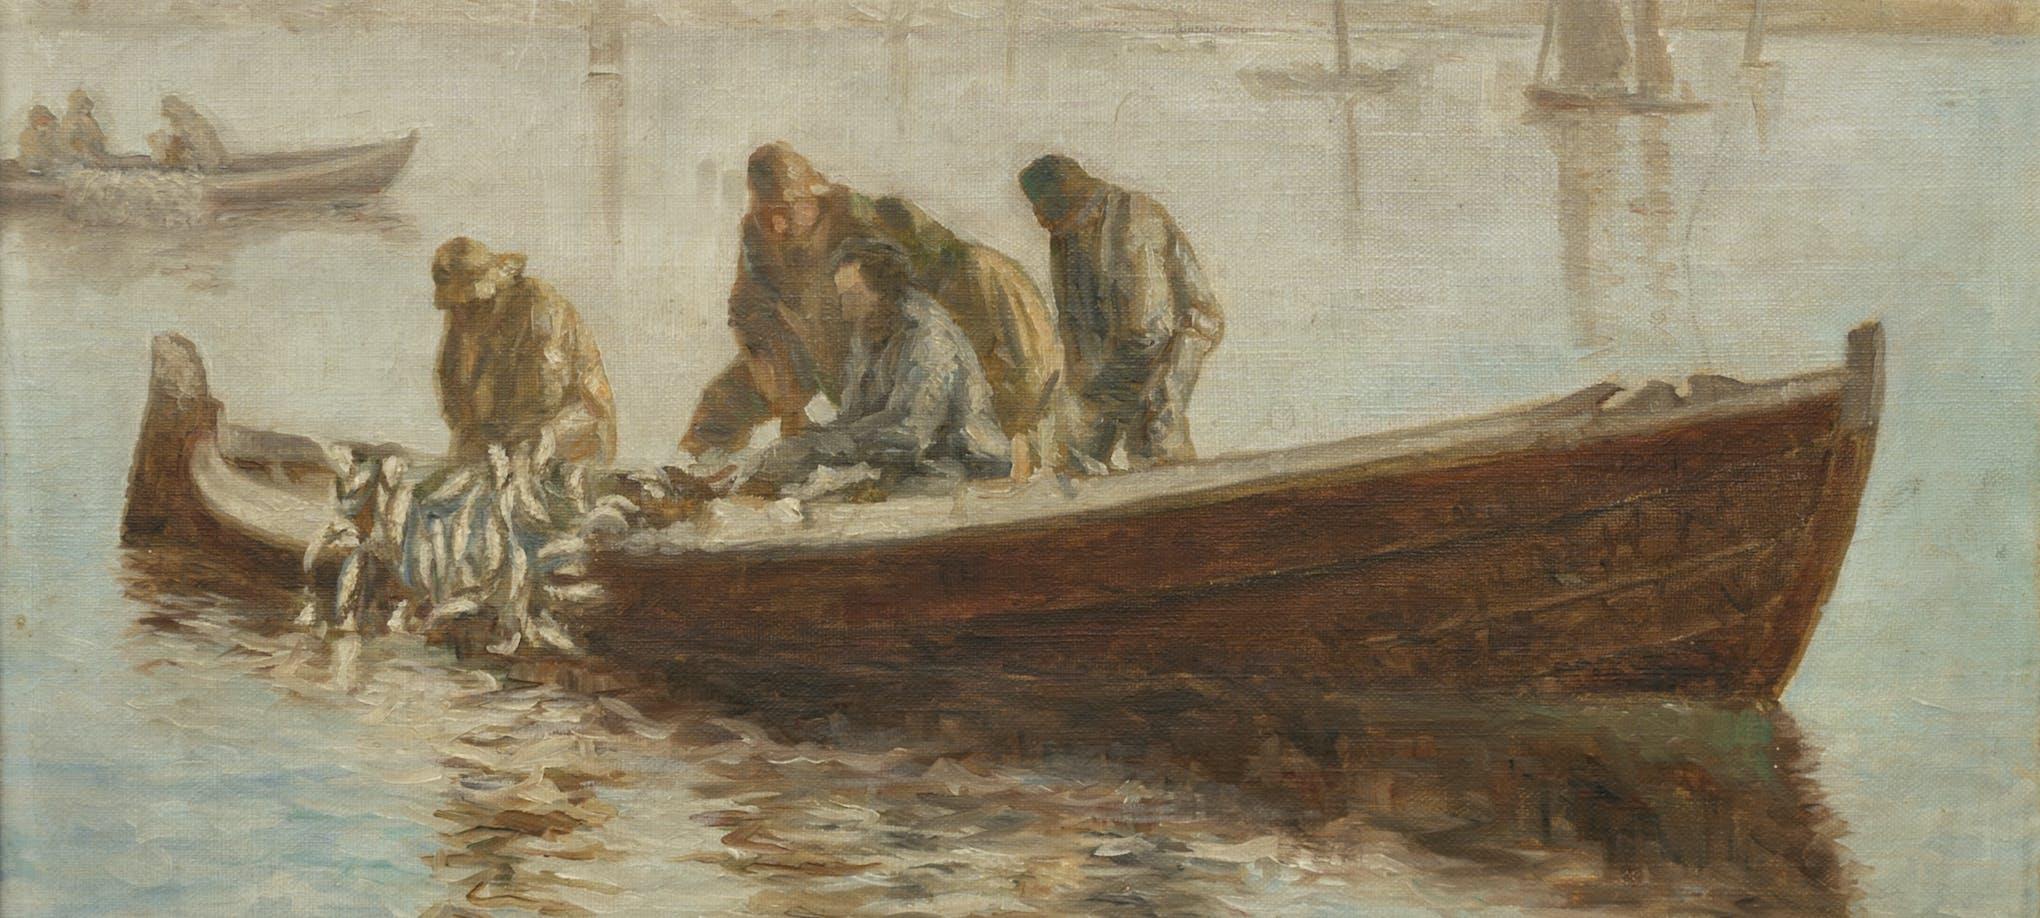 191020 Billedgalleriet kunst oppe